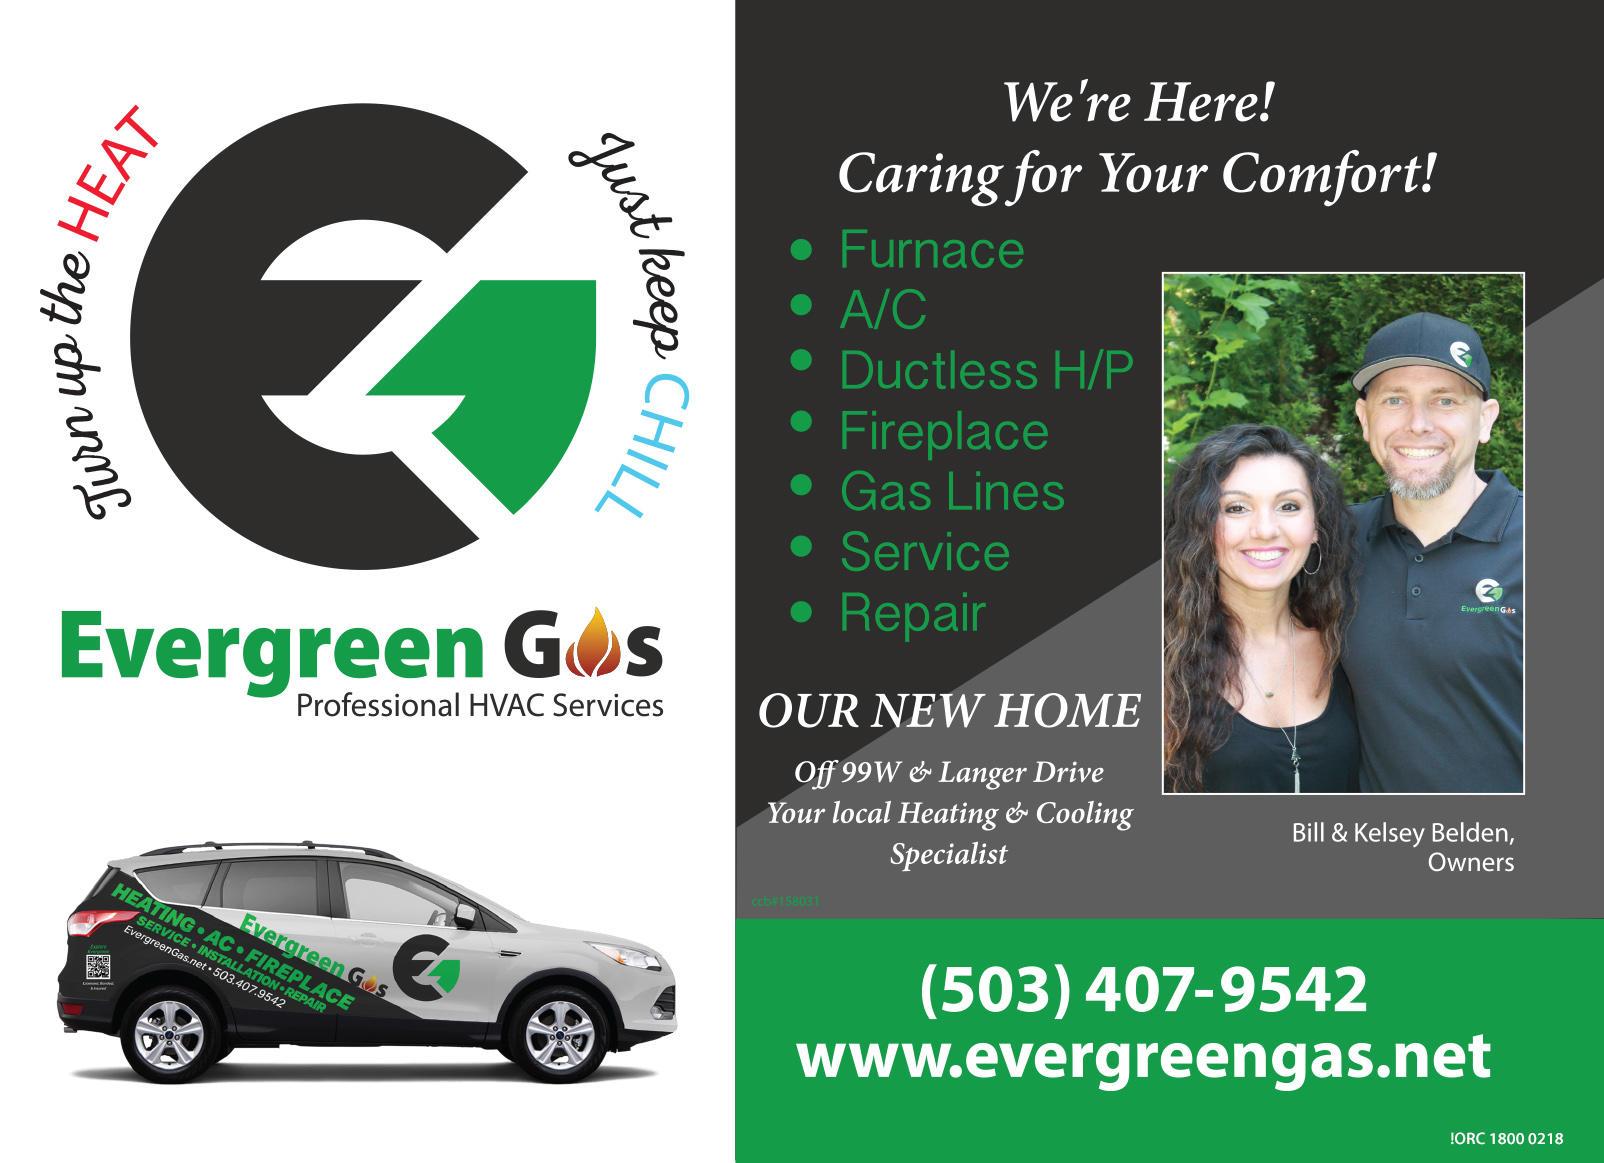 Evergreen Gas Inc image 3